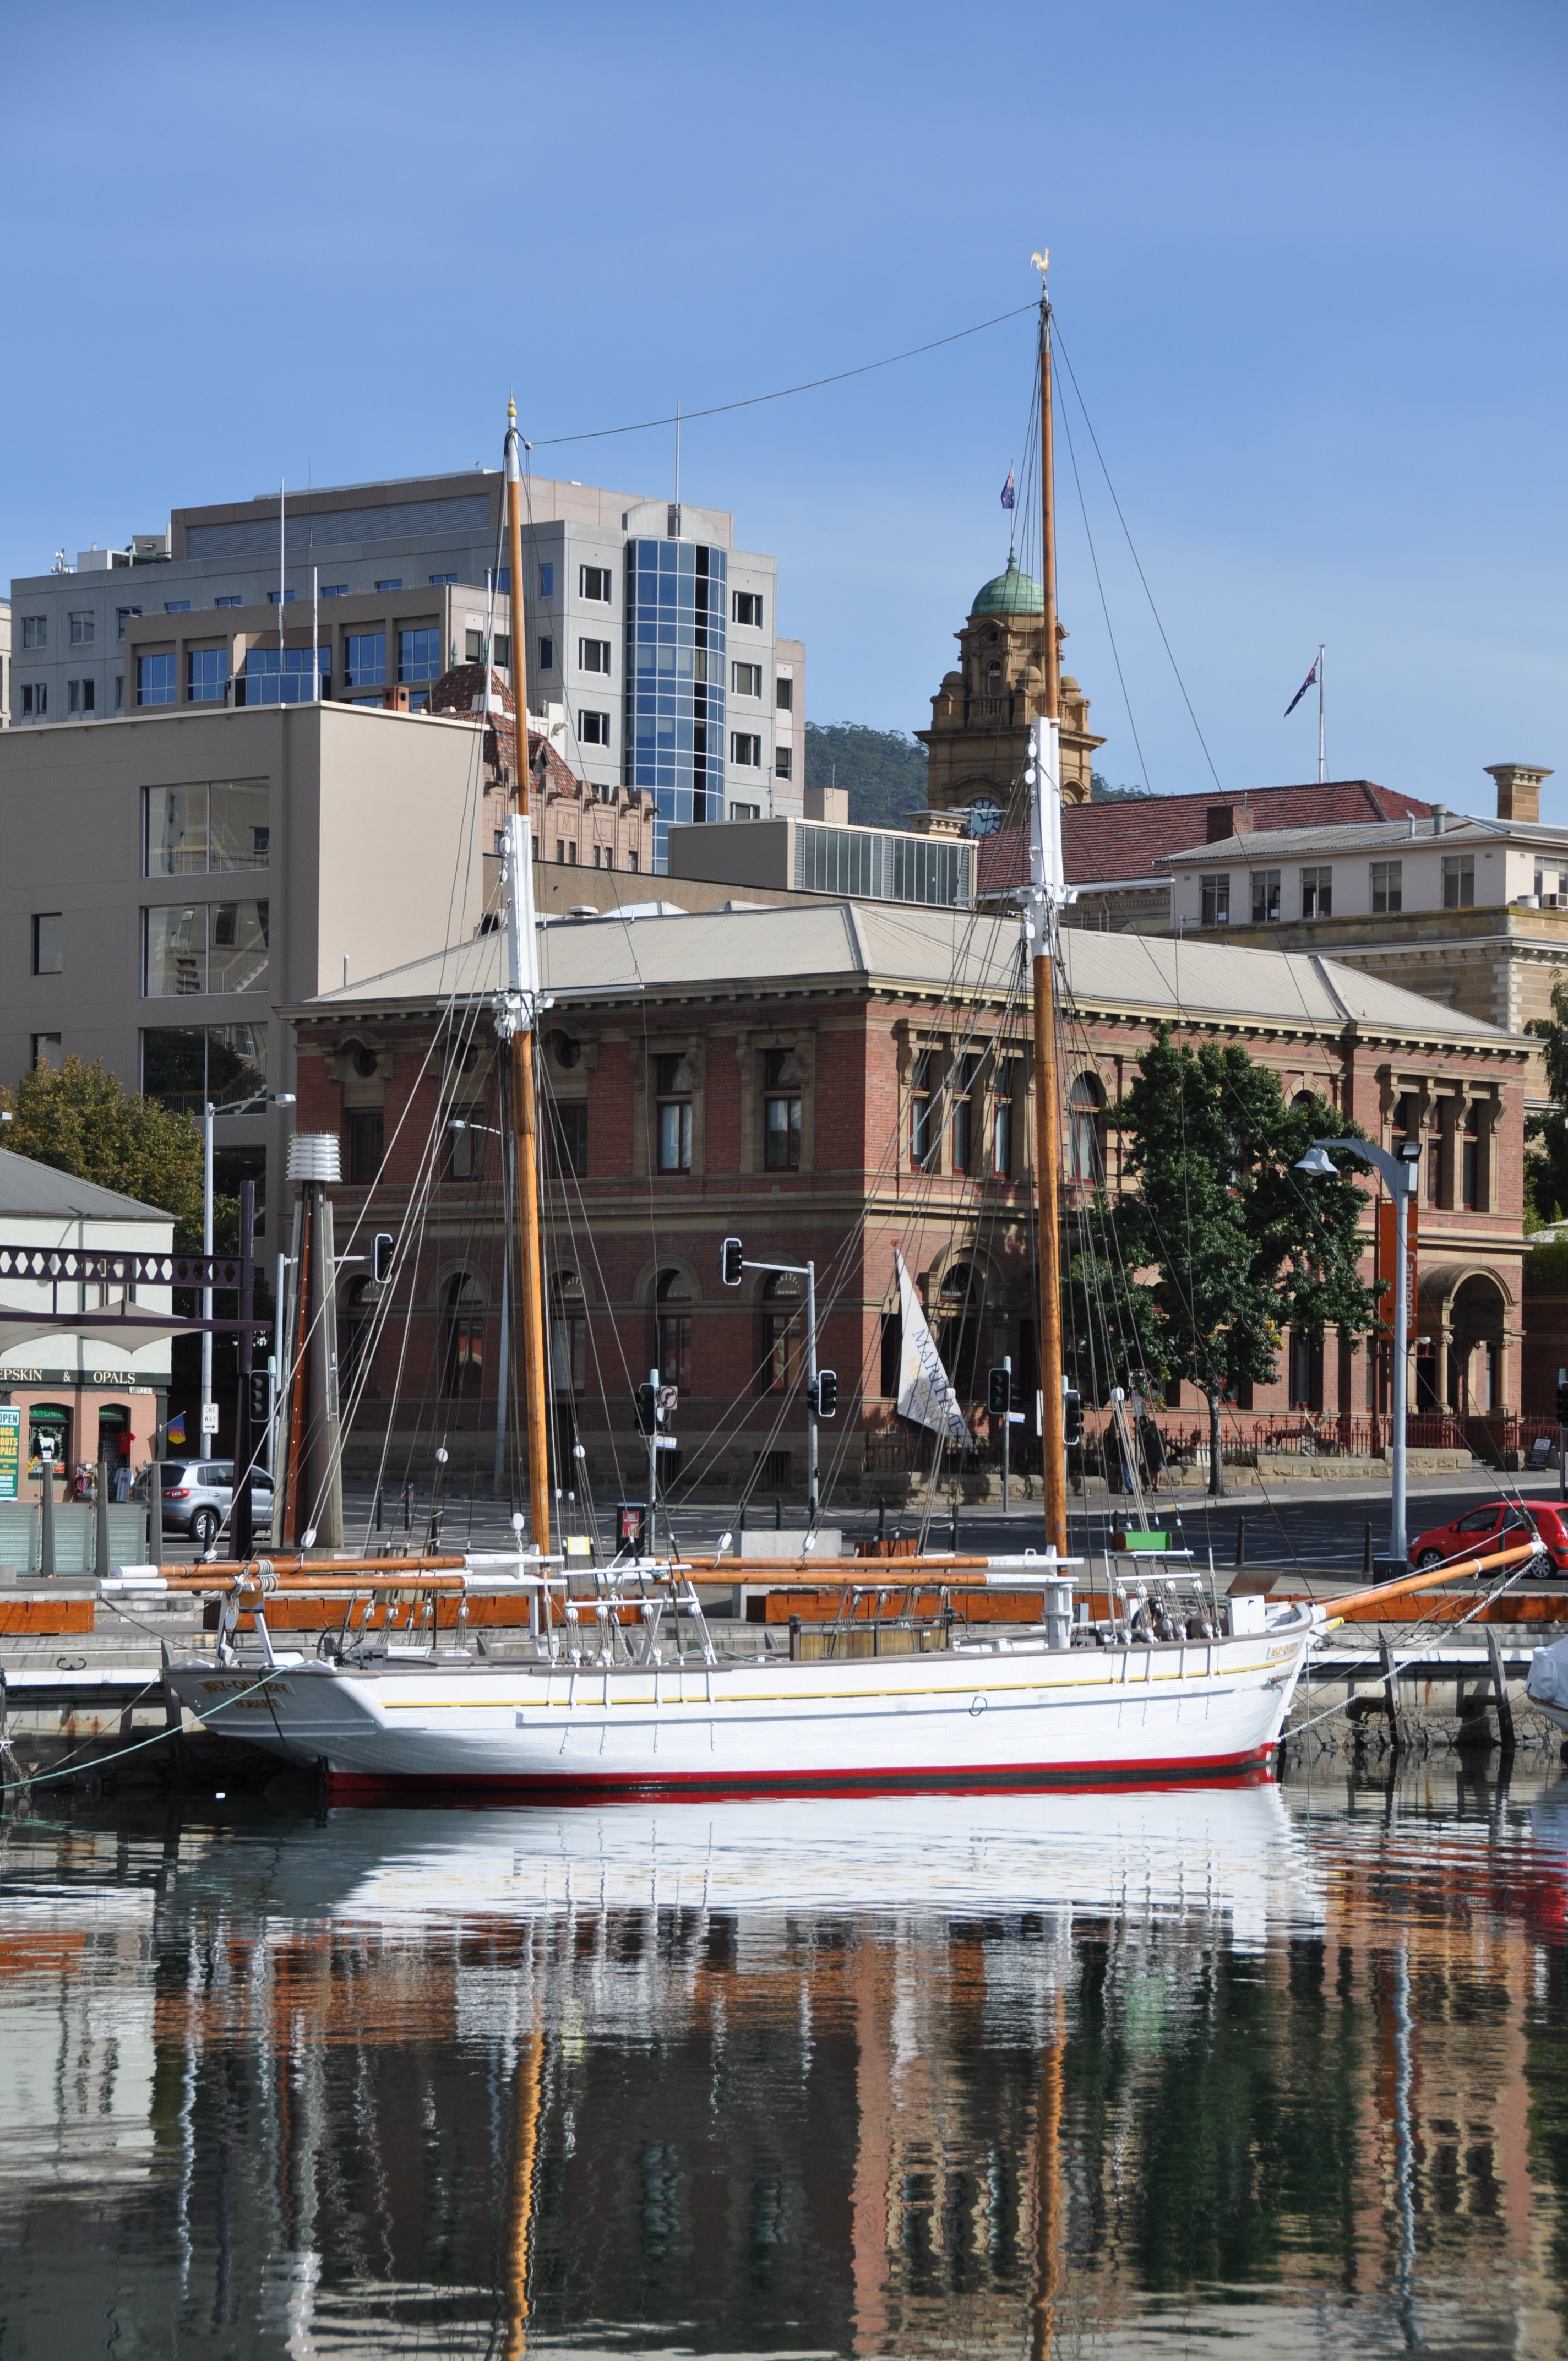 Maritime Museum of Tasmania May Queen Constitution Dock Hobart